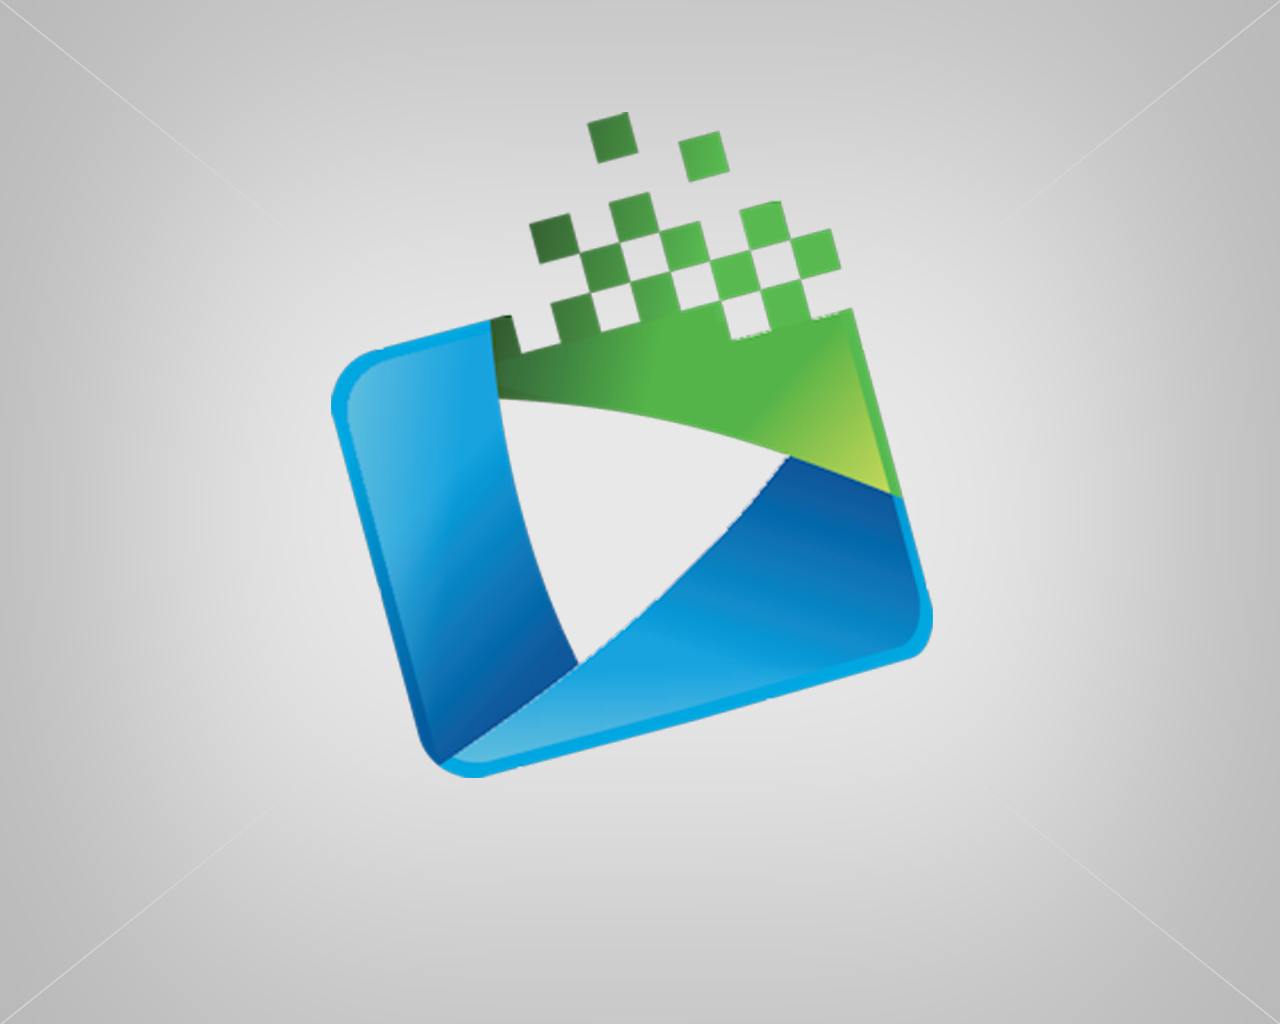 StarzPlay - 0.99£/month